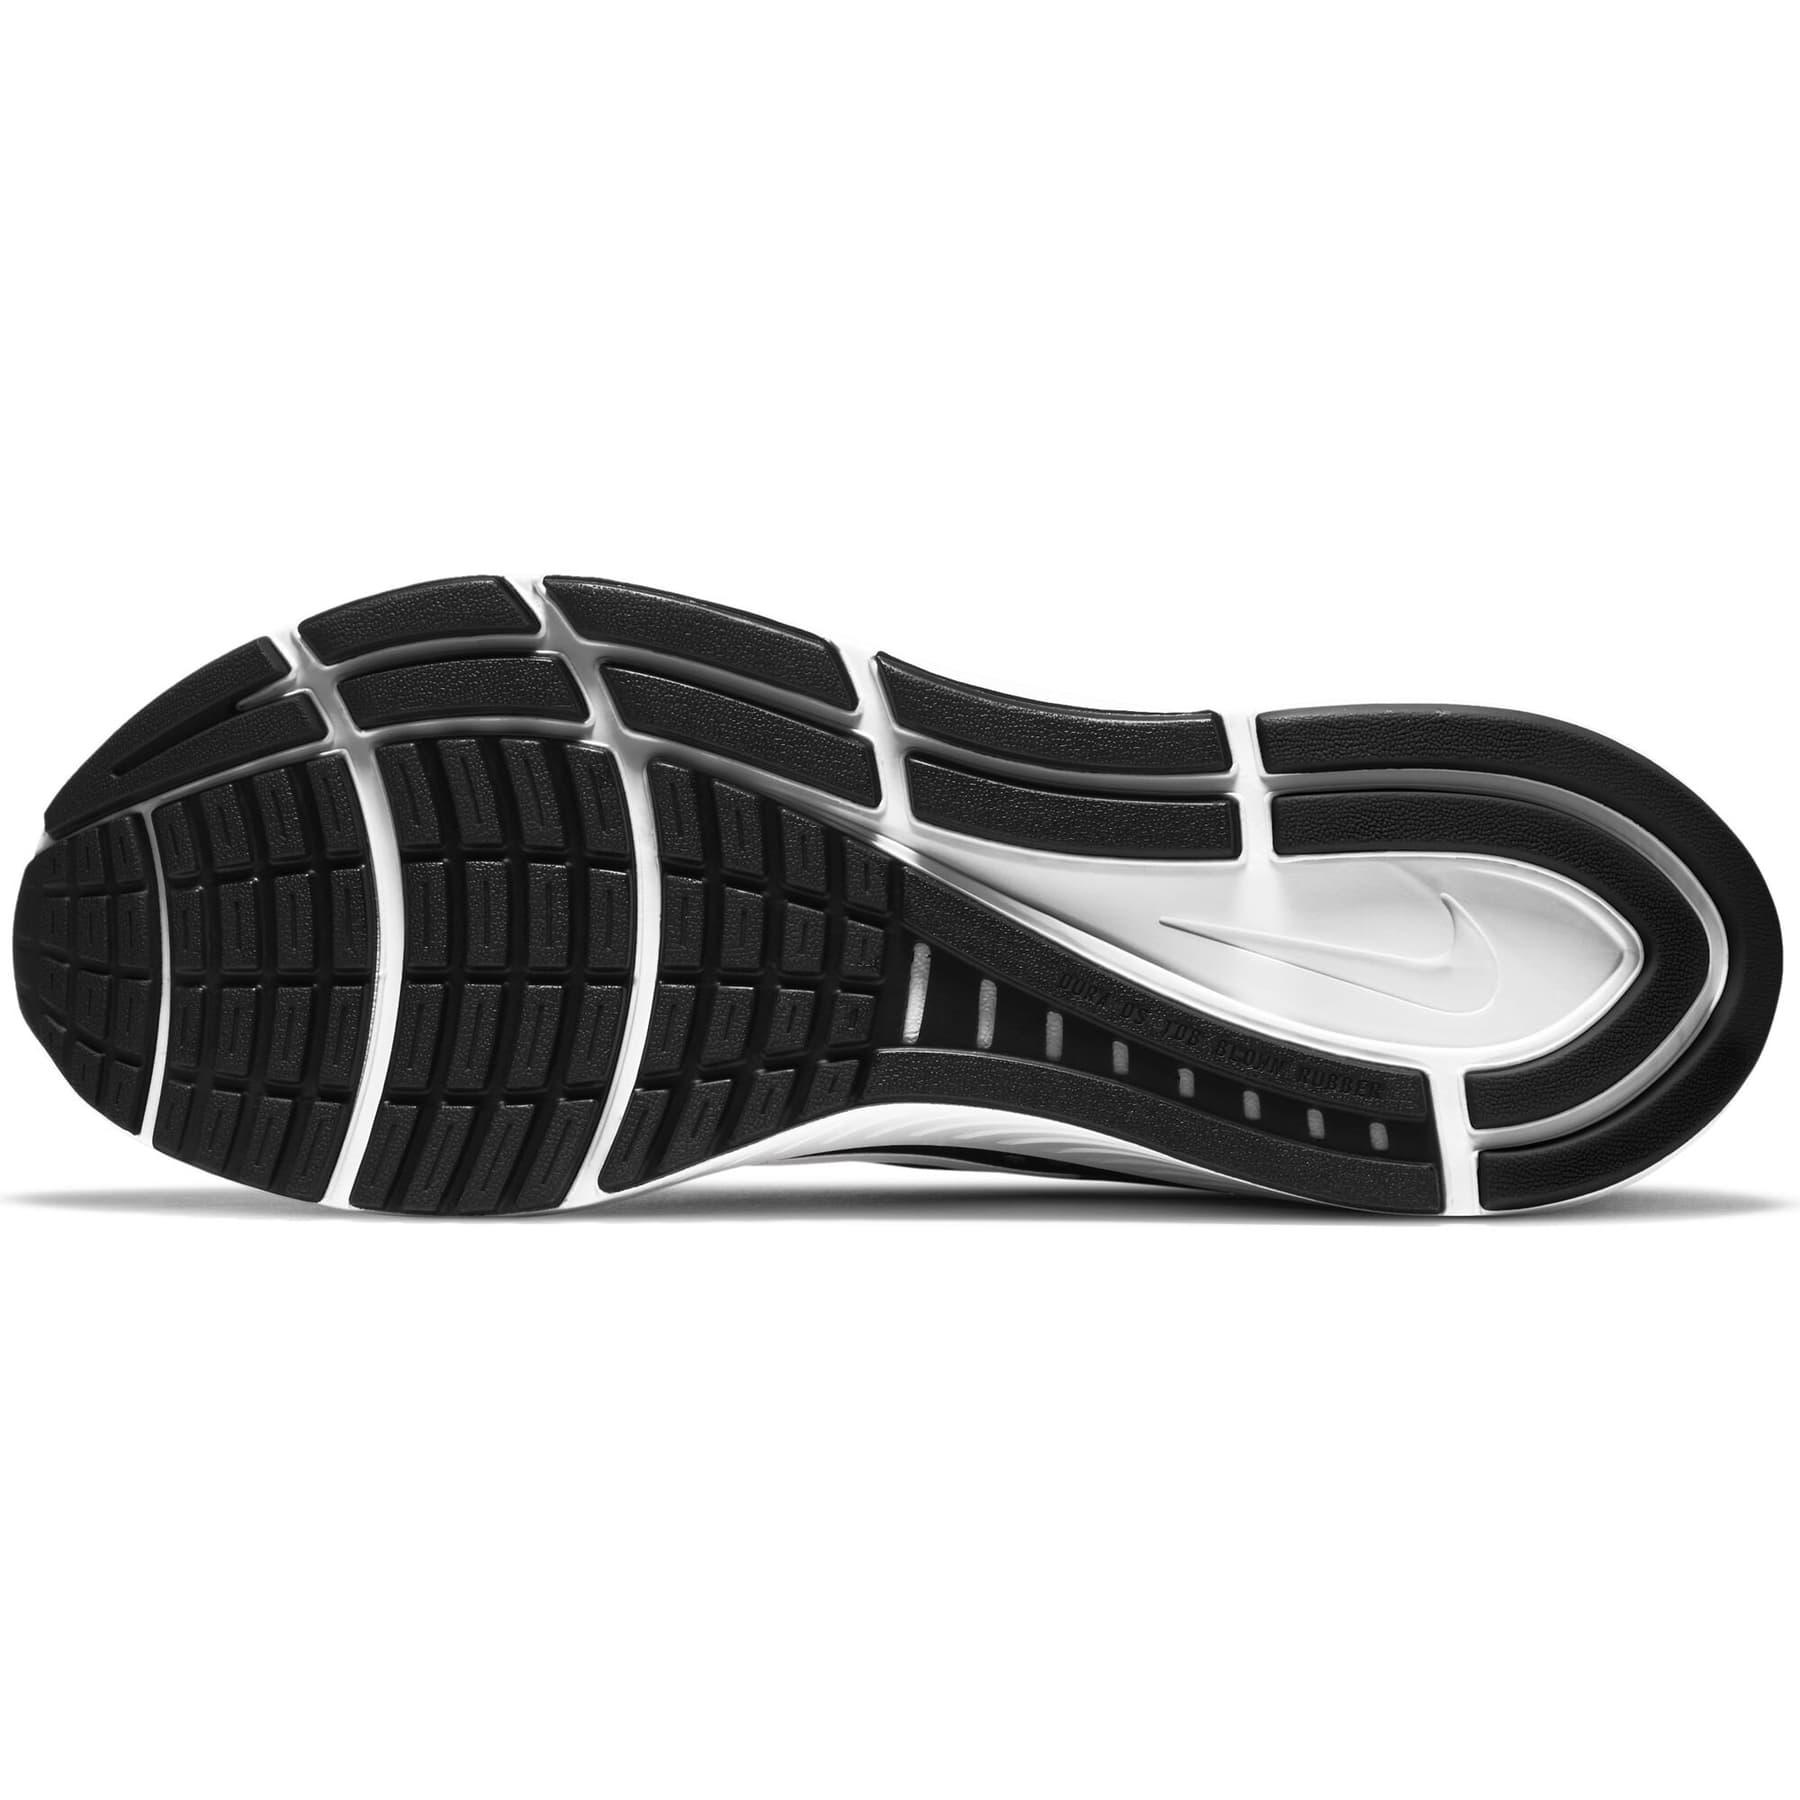 Air Zoom Structure 23 Erkek Siyah Koşu Ayakkabısı (CZ6720-001)